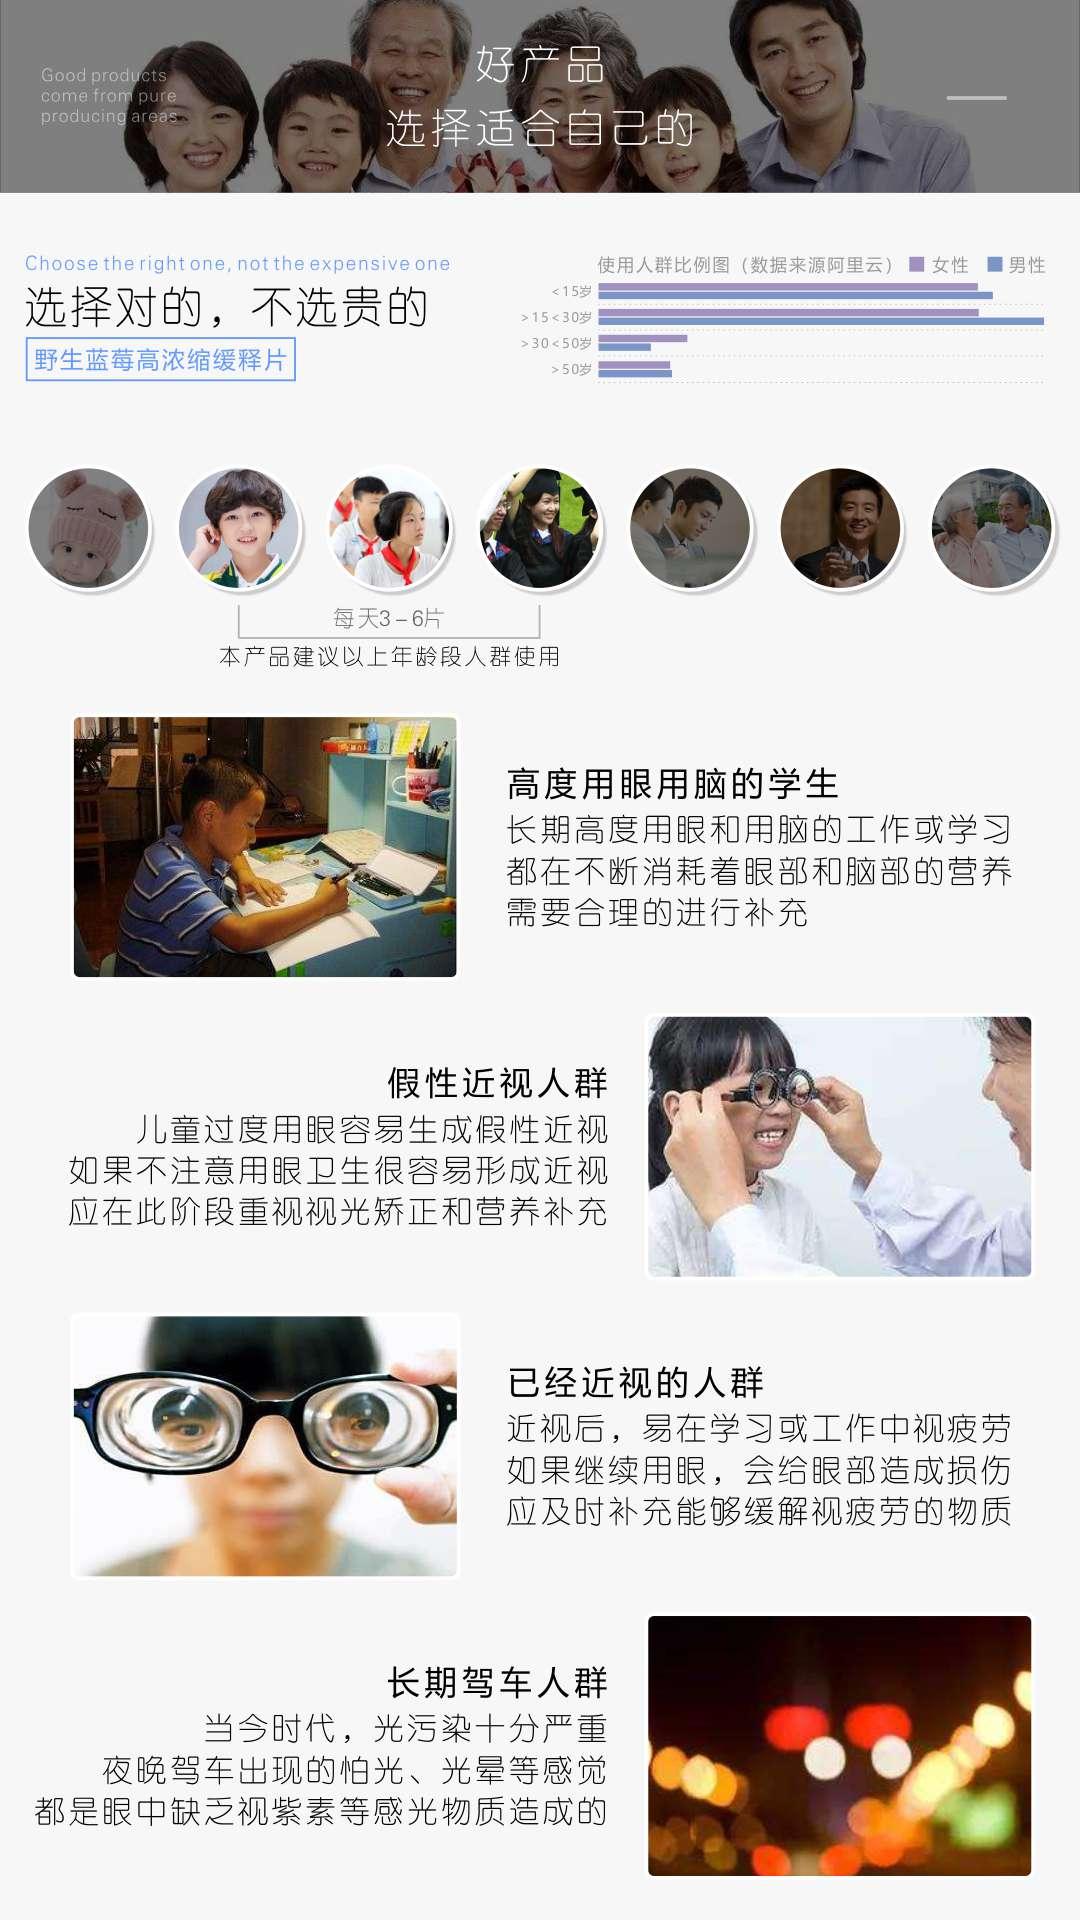 Z 至臻尚品-臻明眸藍莓花青素片-12.jpg